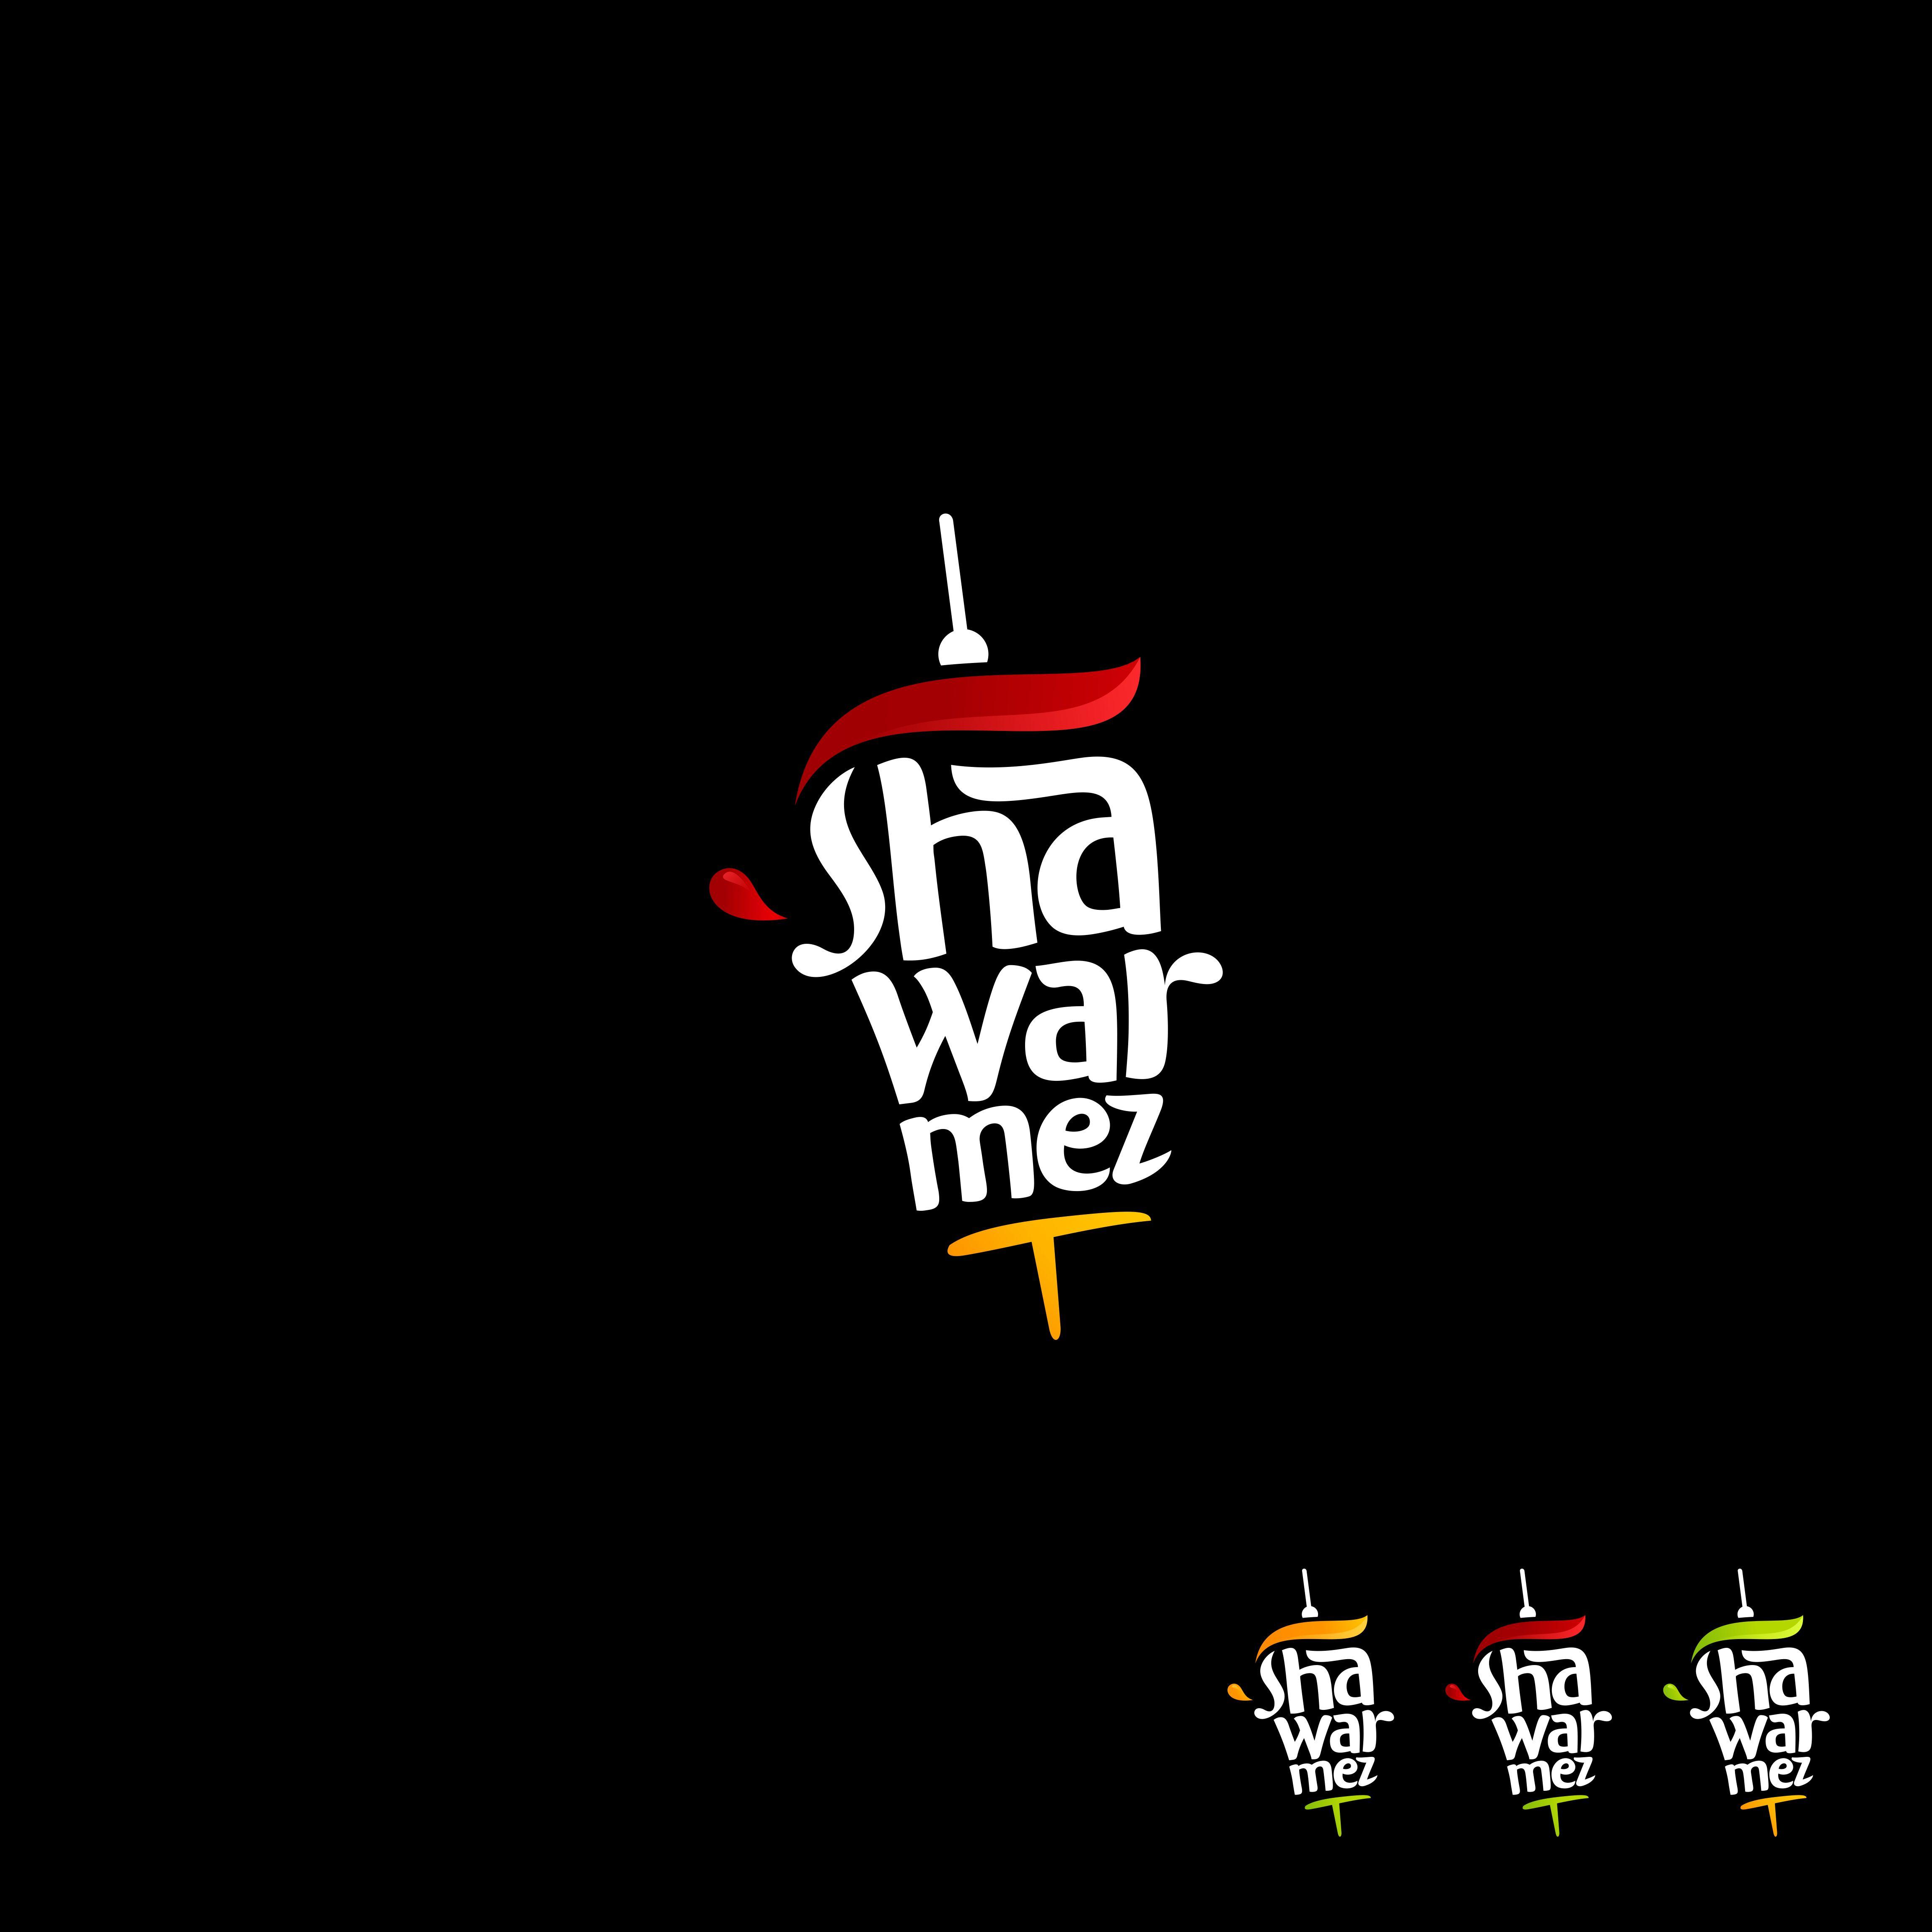 Fast Food Names And Logos